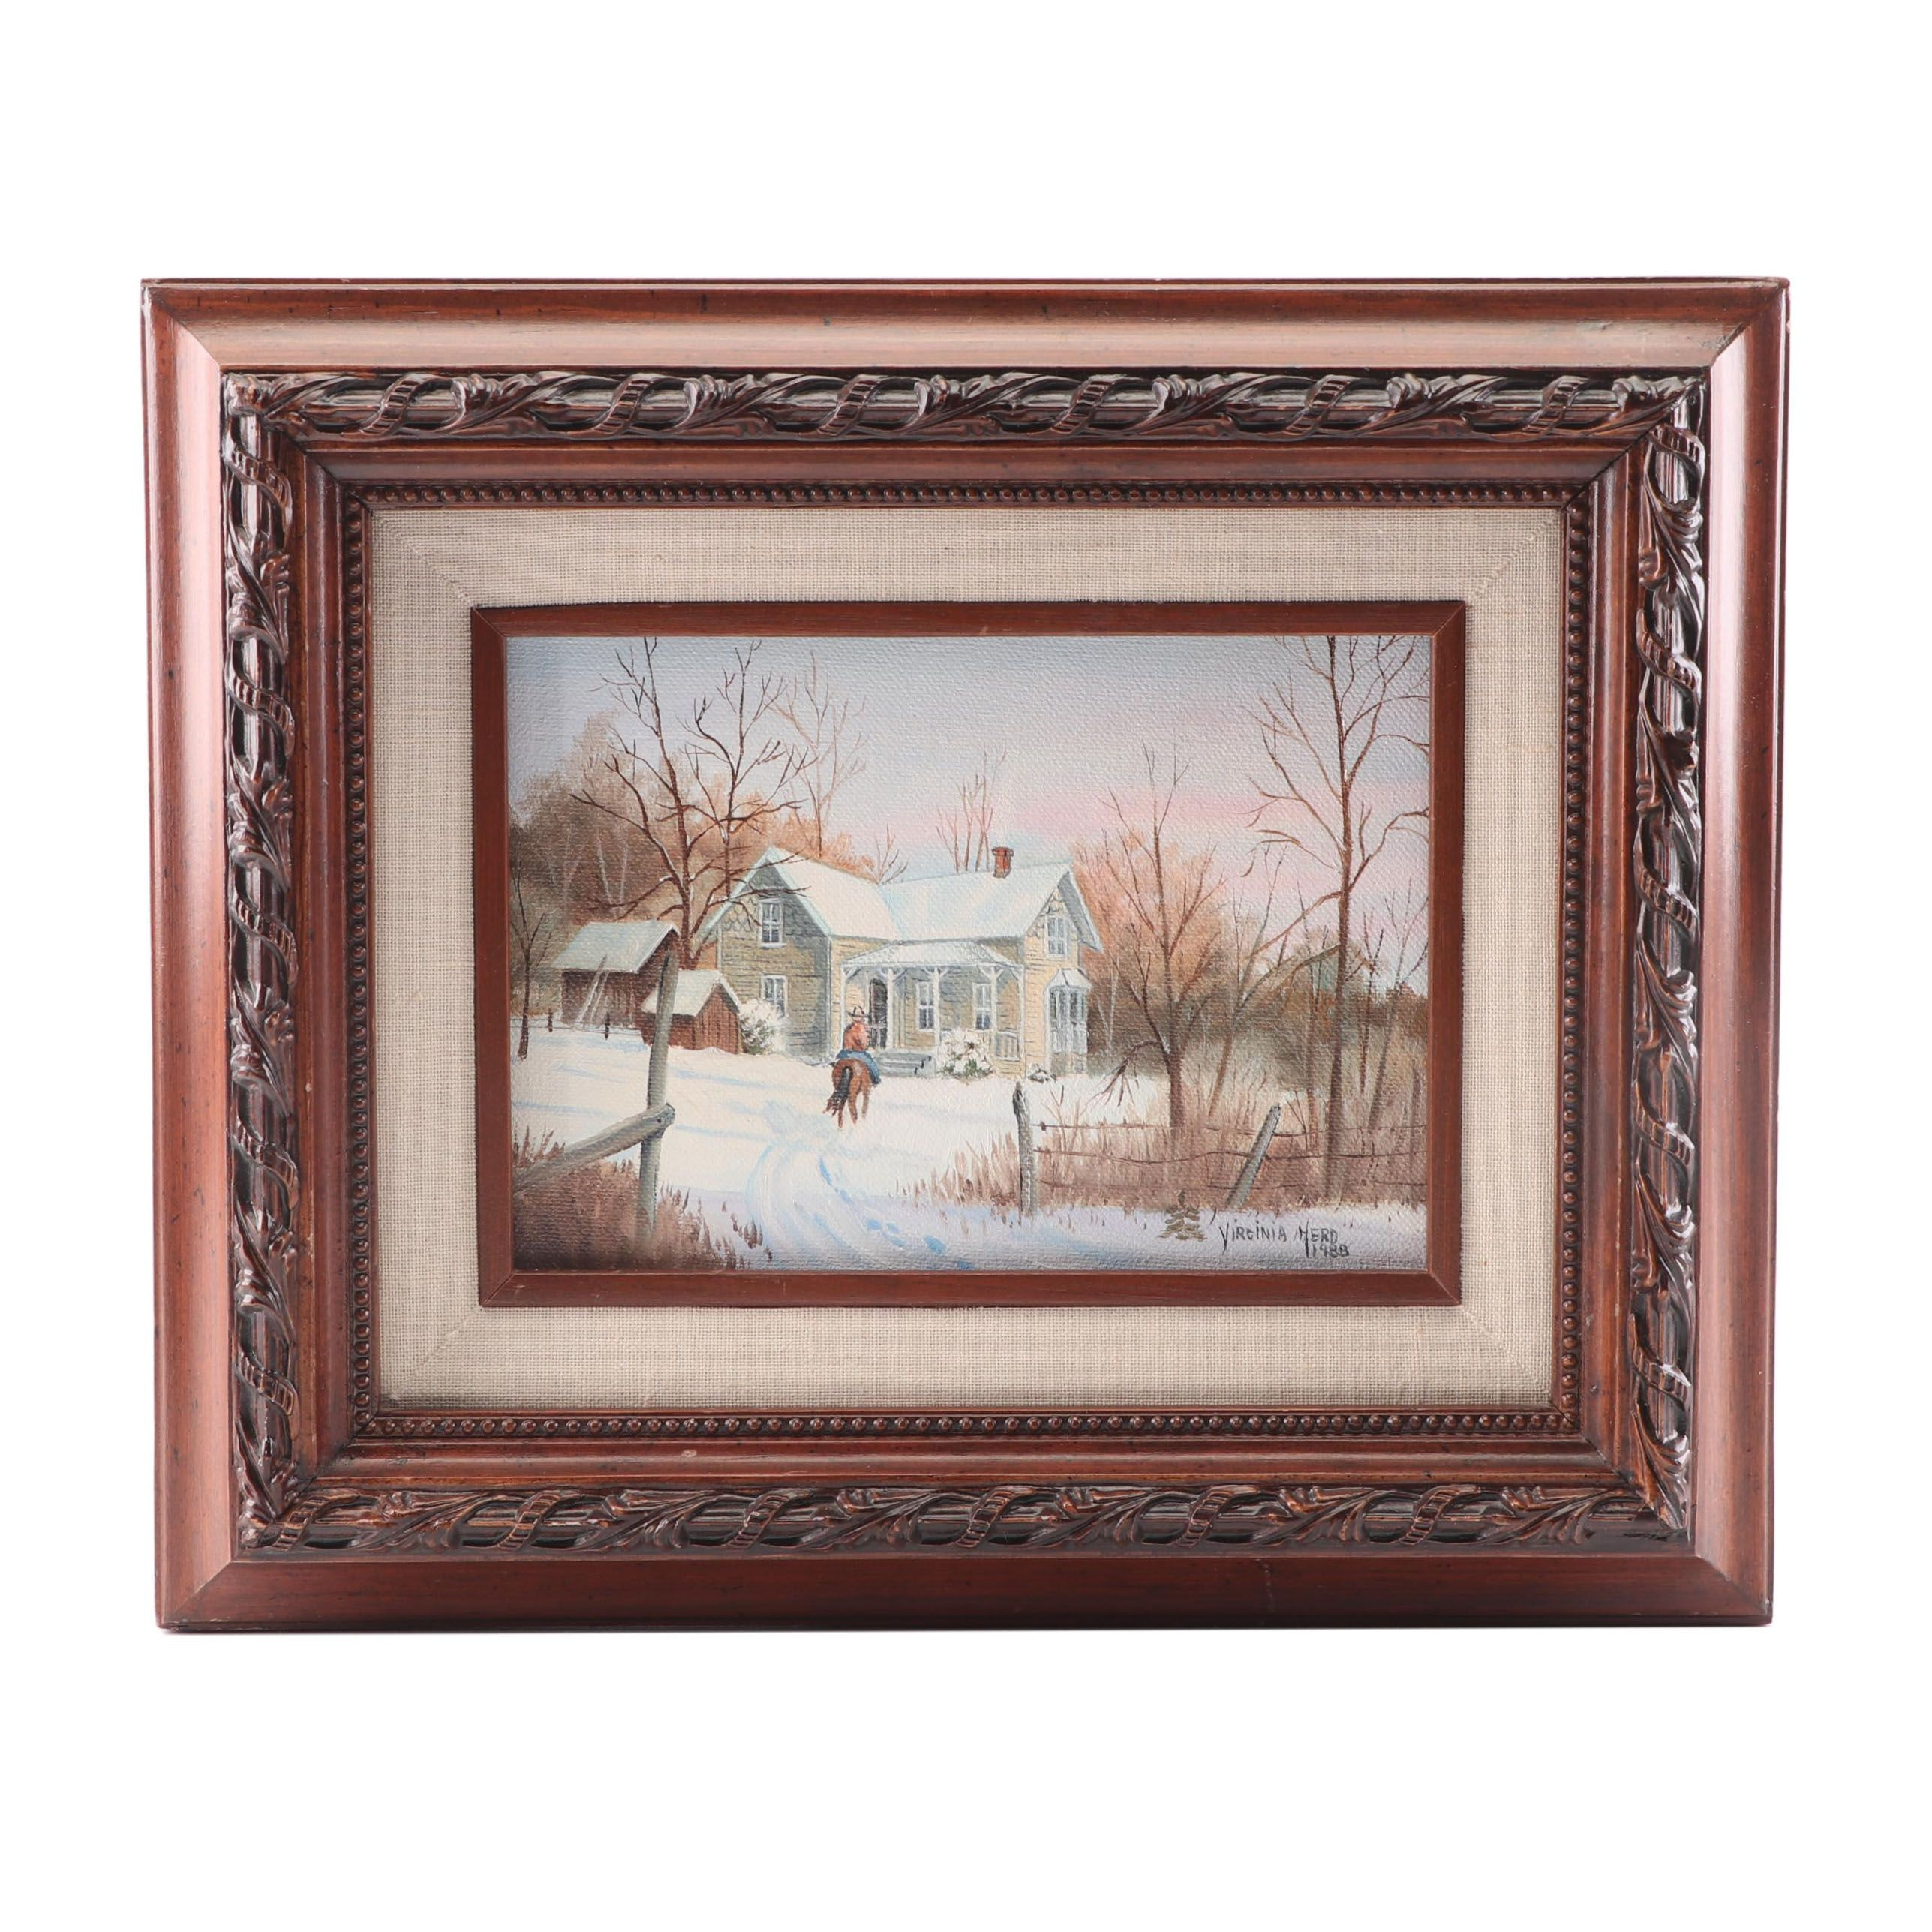 Virginia Herd Winter Landscape Oil Painting